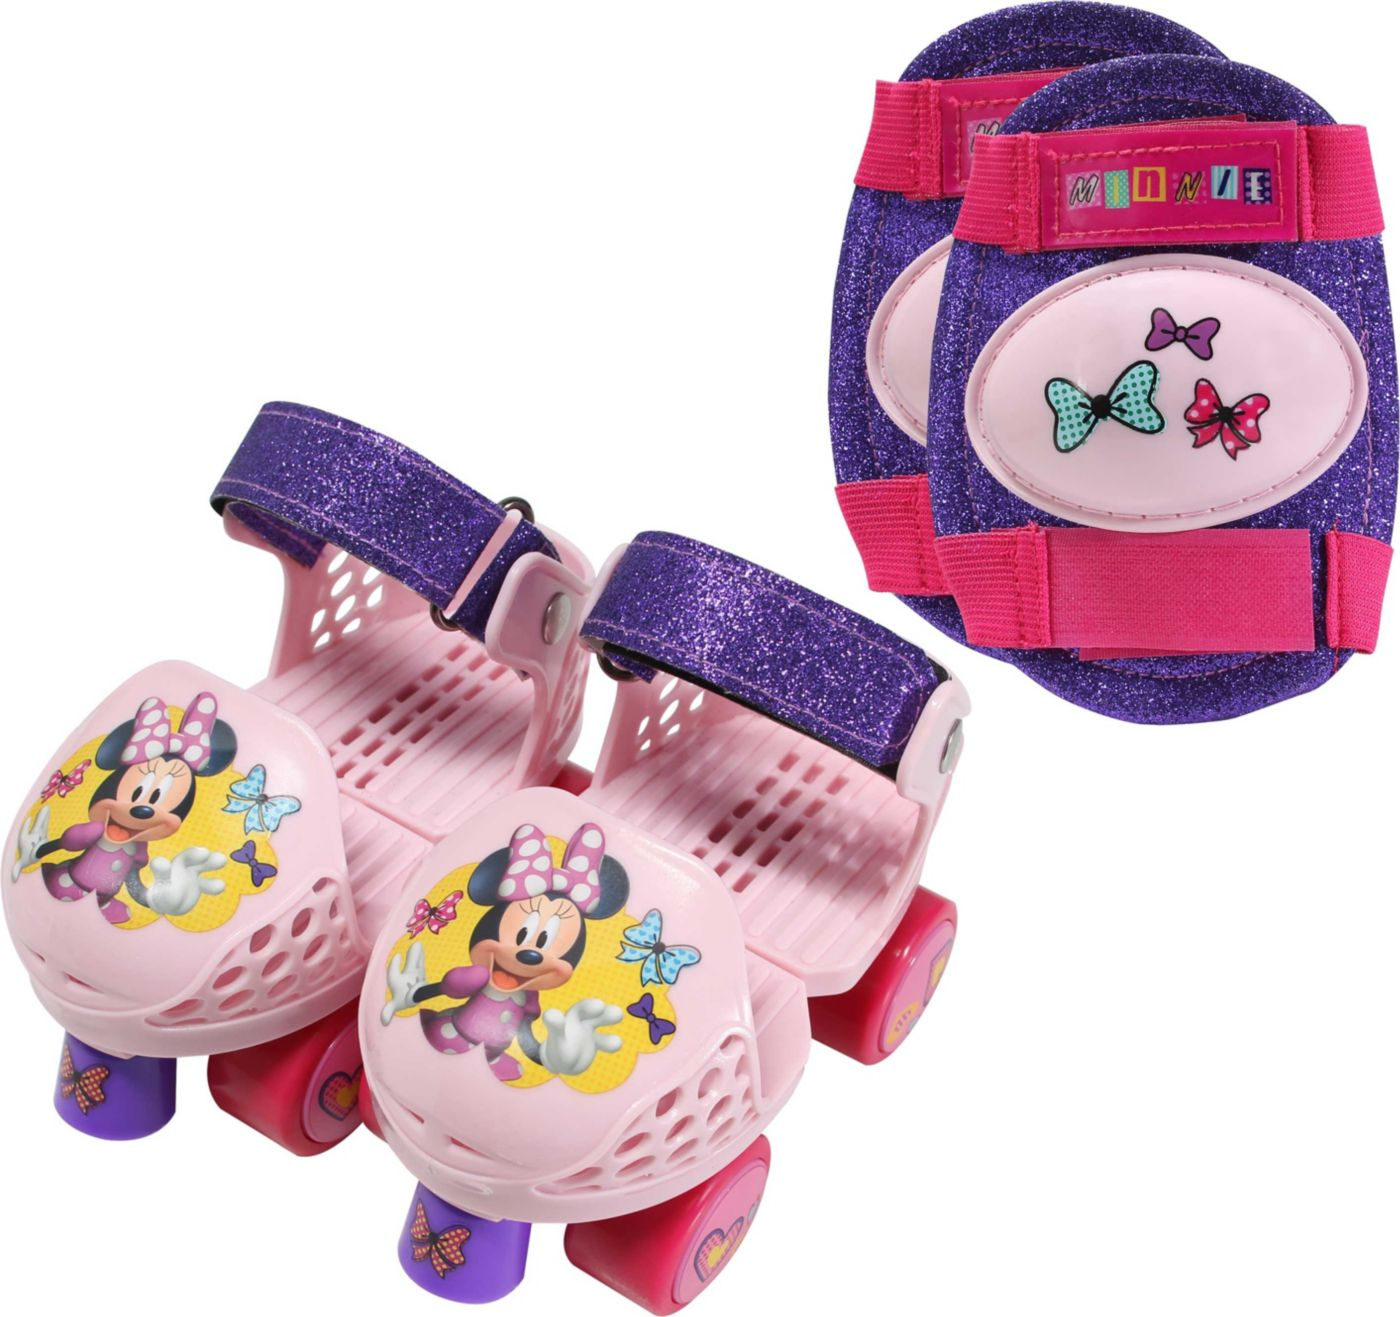 Playhweels Girls' Disney Minnie Mouse Roller Skates and Knee Pads